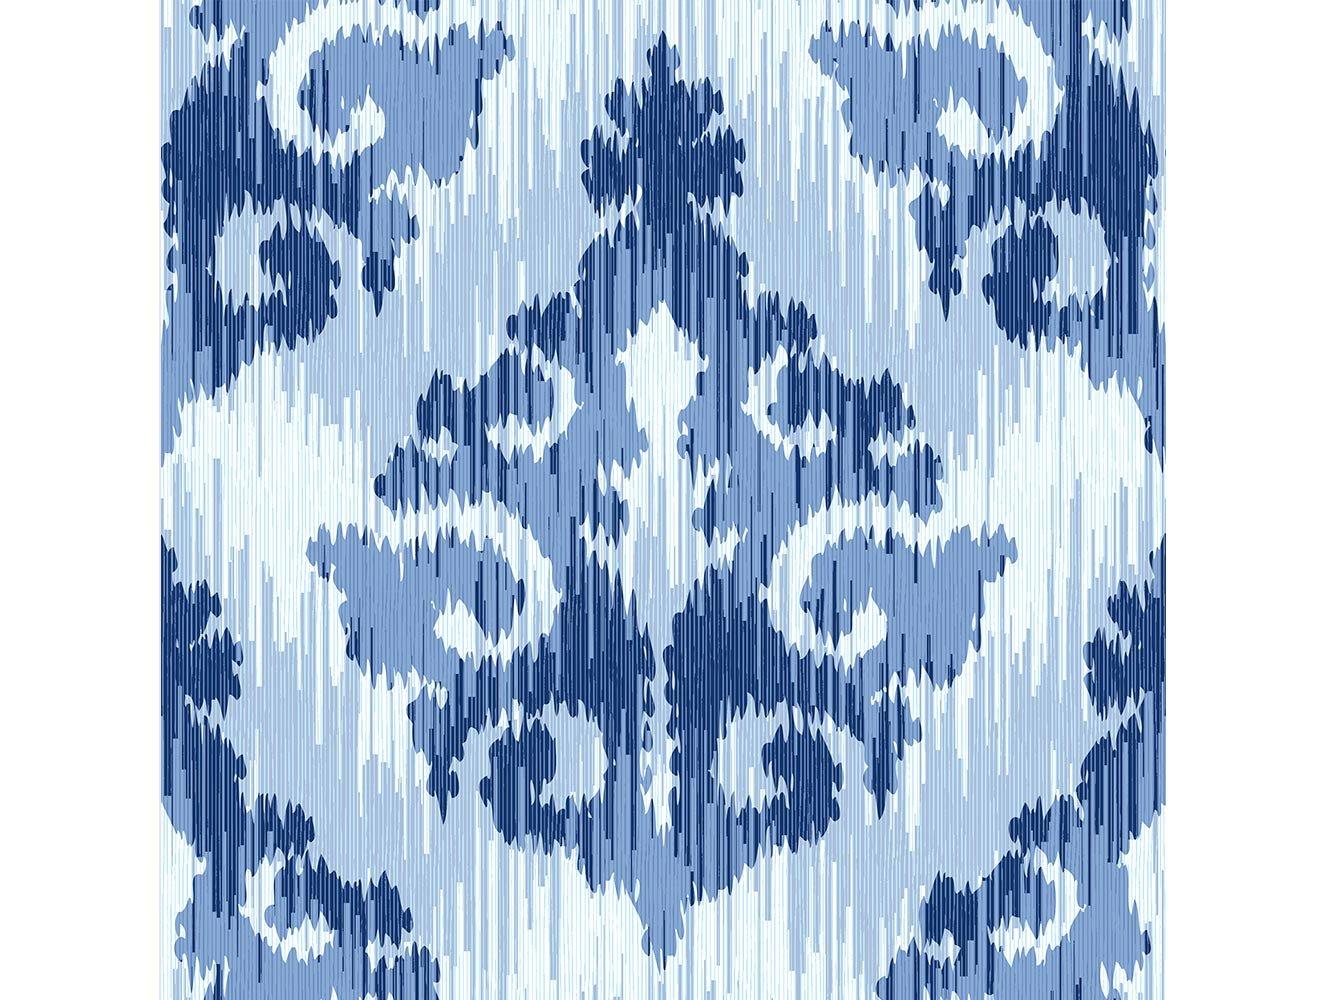 Decoraci/ón del Hogar Alfombra Estampado Damasco Exagonos Tonos Azules Multicolor PVC Moqueta PVC 95 cm x 200 cm Suelo vinilico